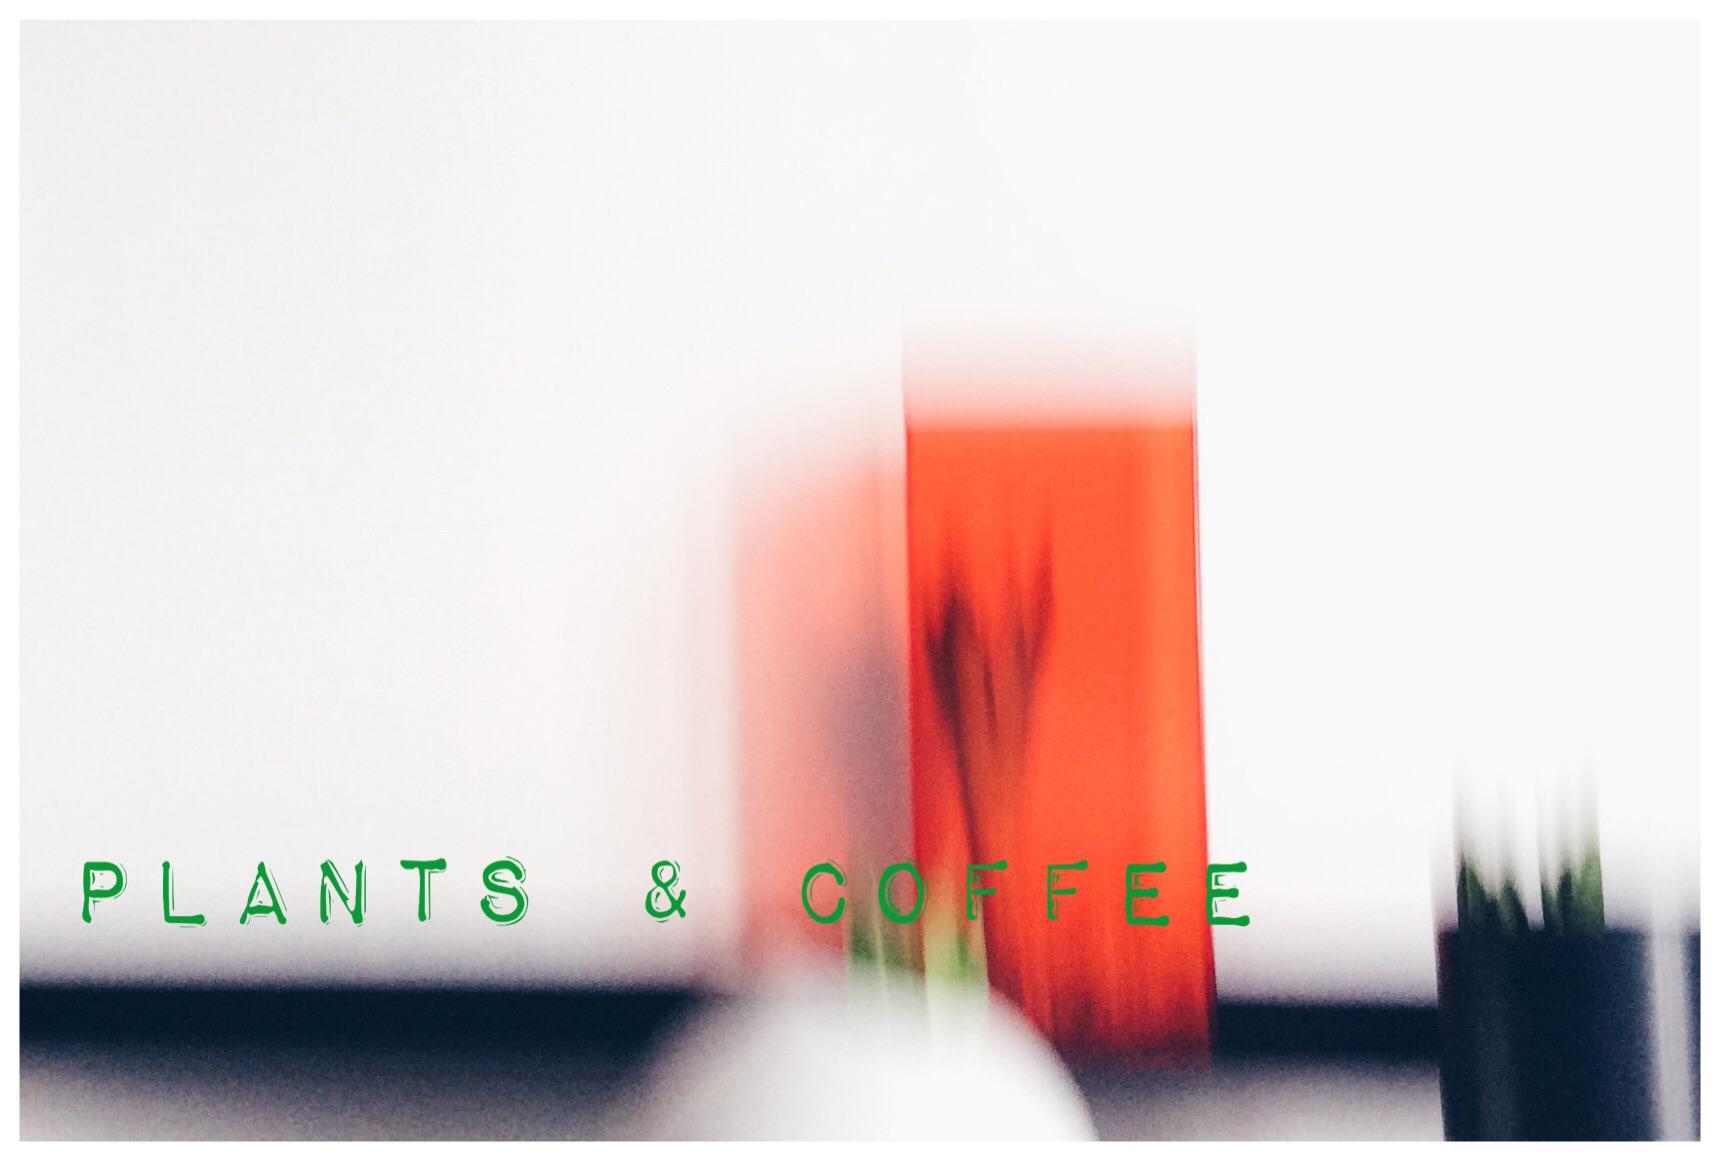 Plants & Coffee - Urbanjunglebloggers - knobz